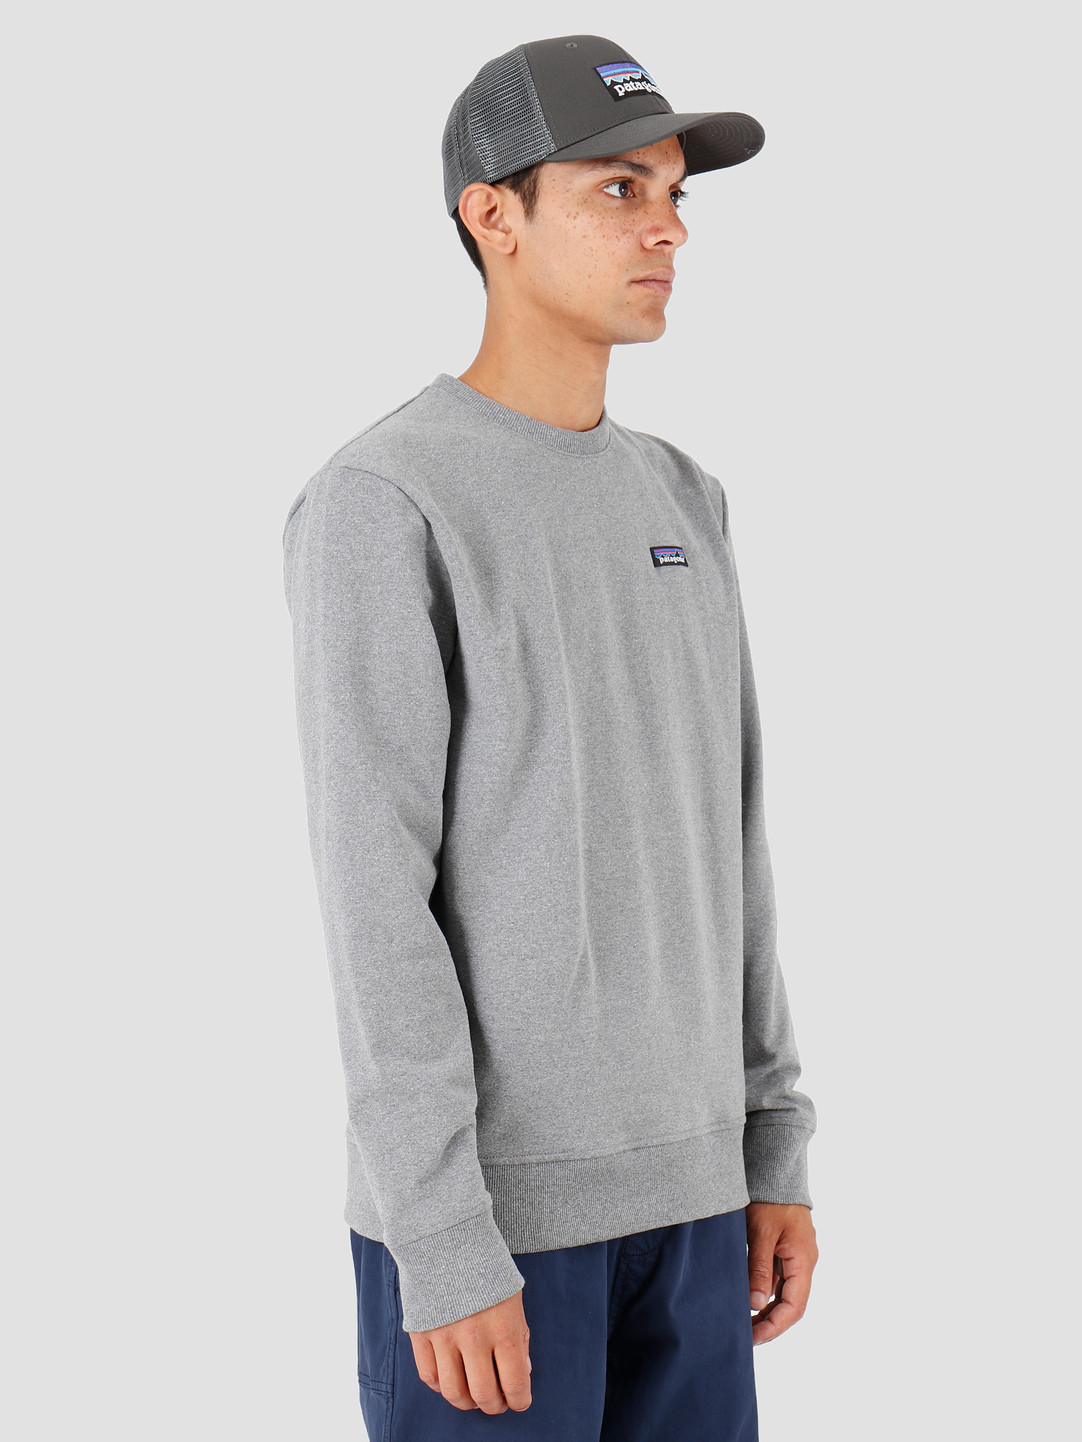 Patagonia P 6 Label Uprisal Crew Sweatshirt Gravel Heather 39543